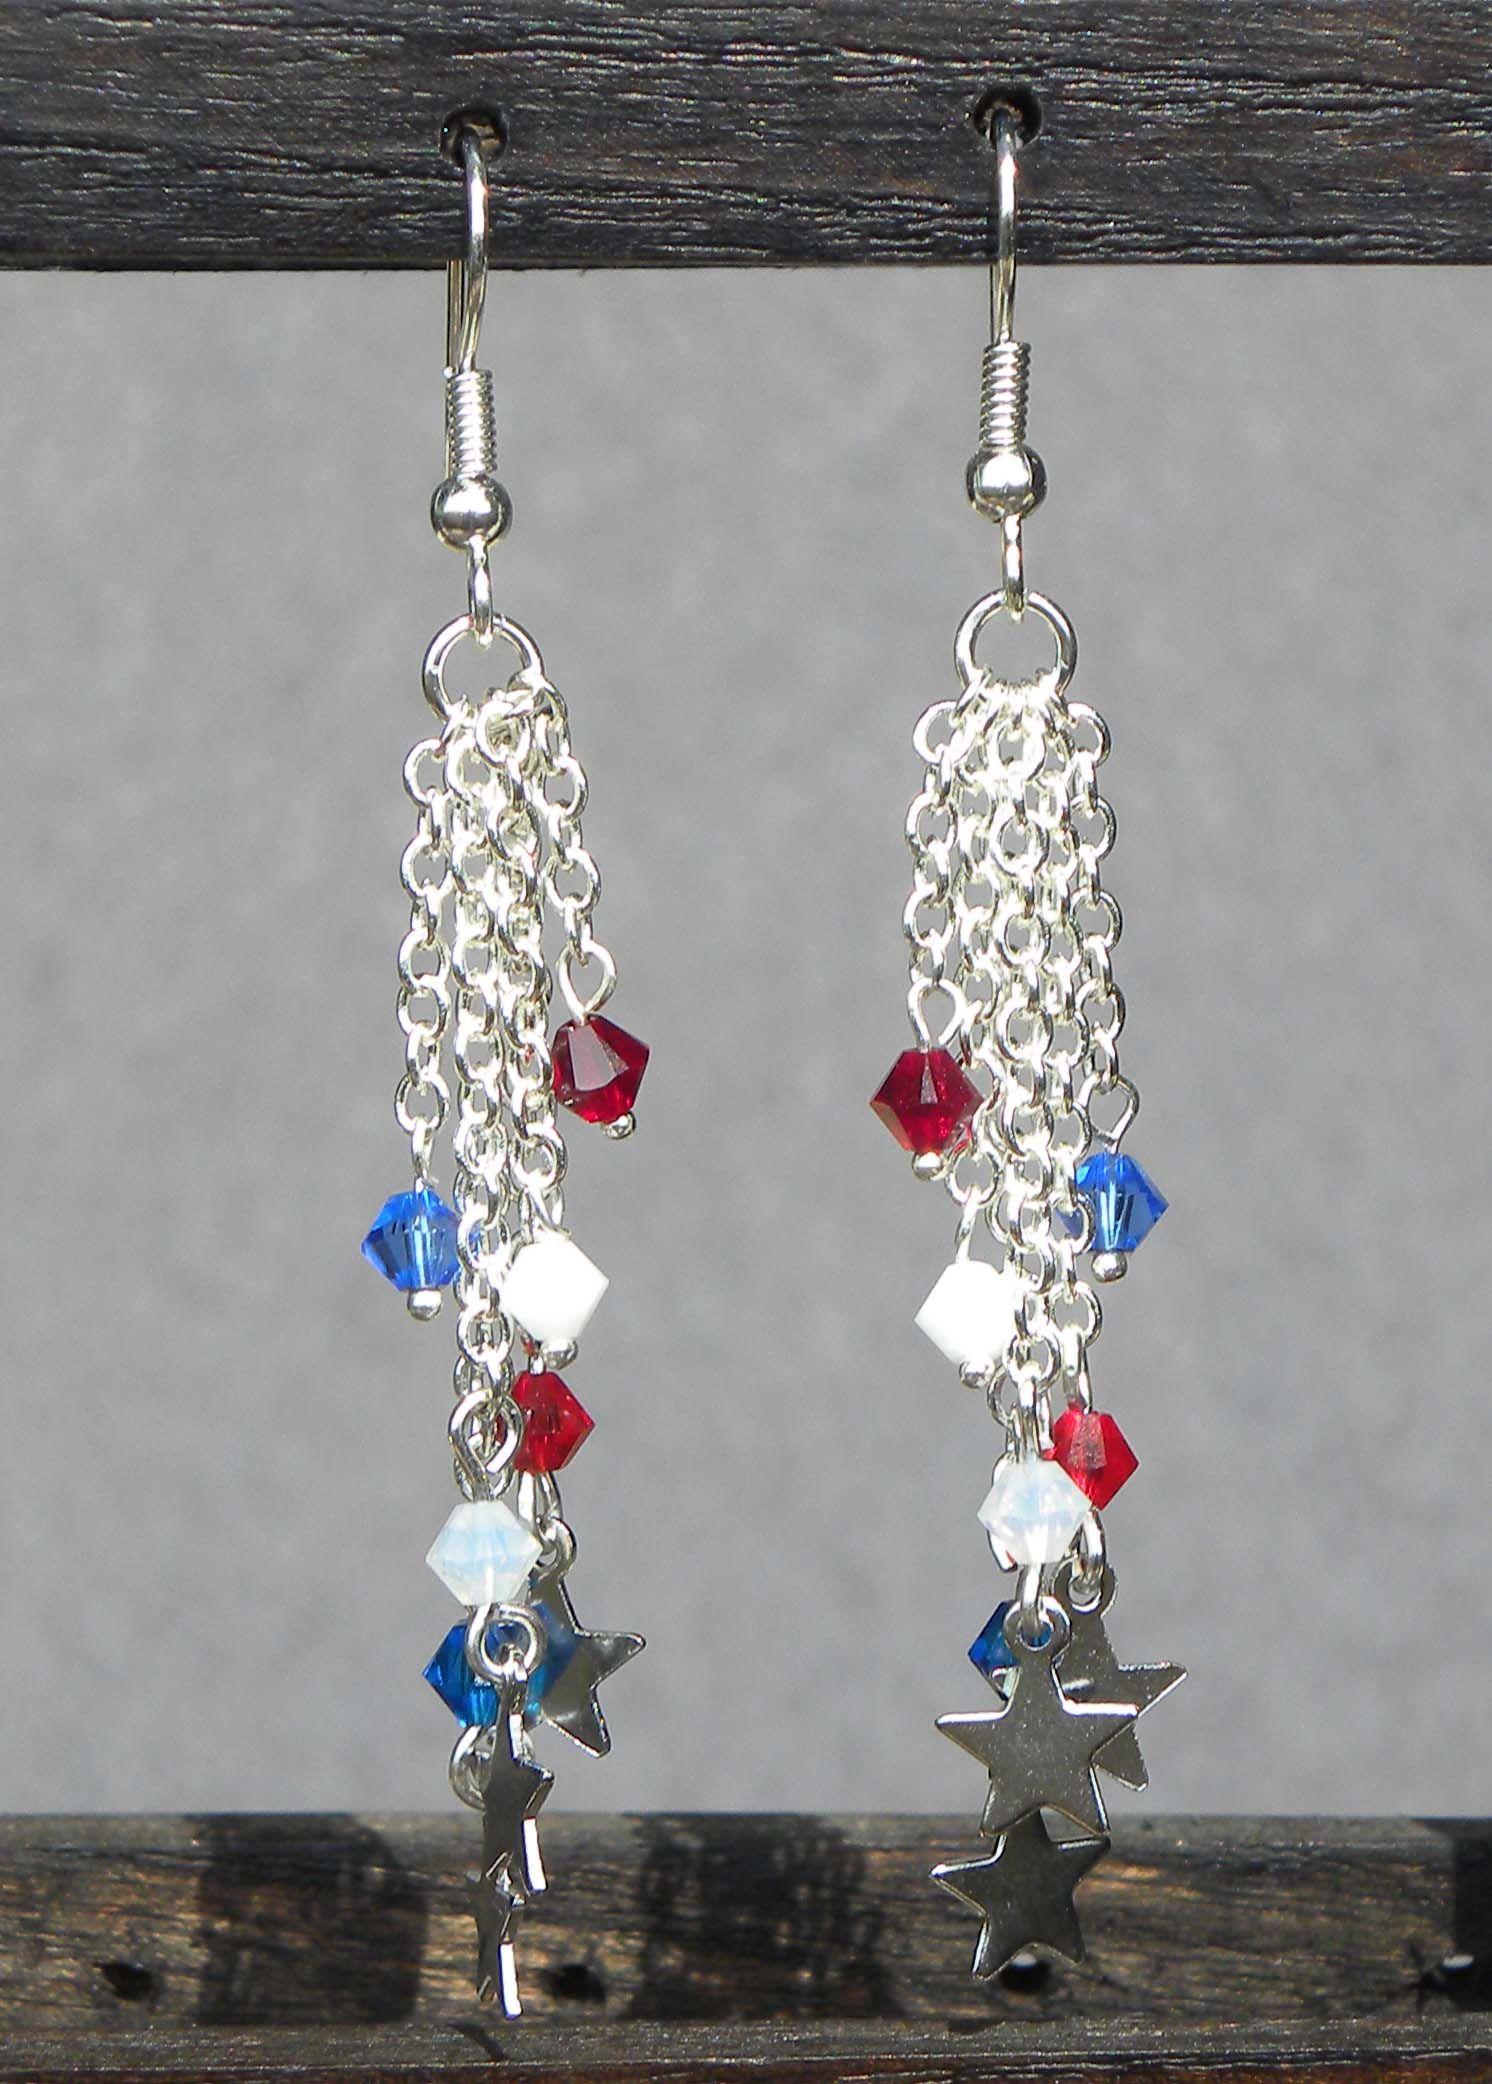 Diy Red And Black Eye Makeup: Shimmering Tassel Earrings In Red, White And Blue ... #DIY